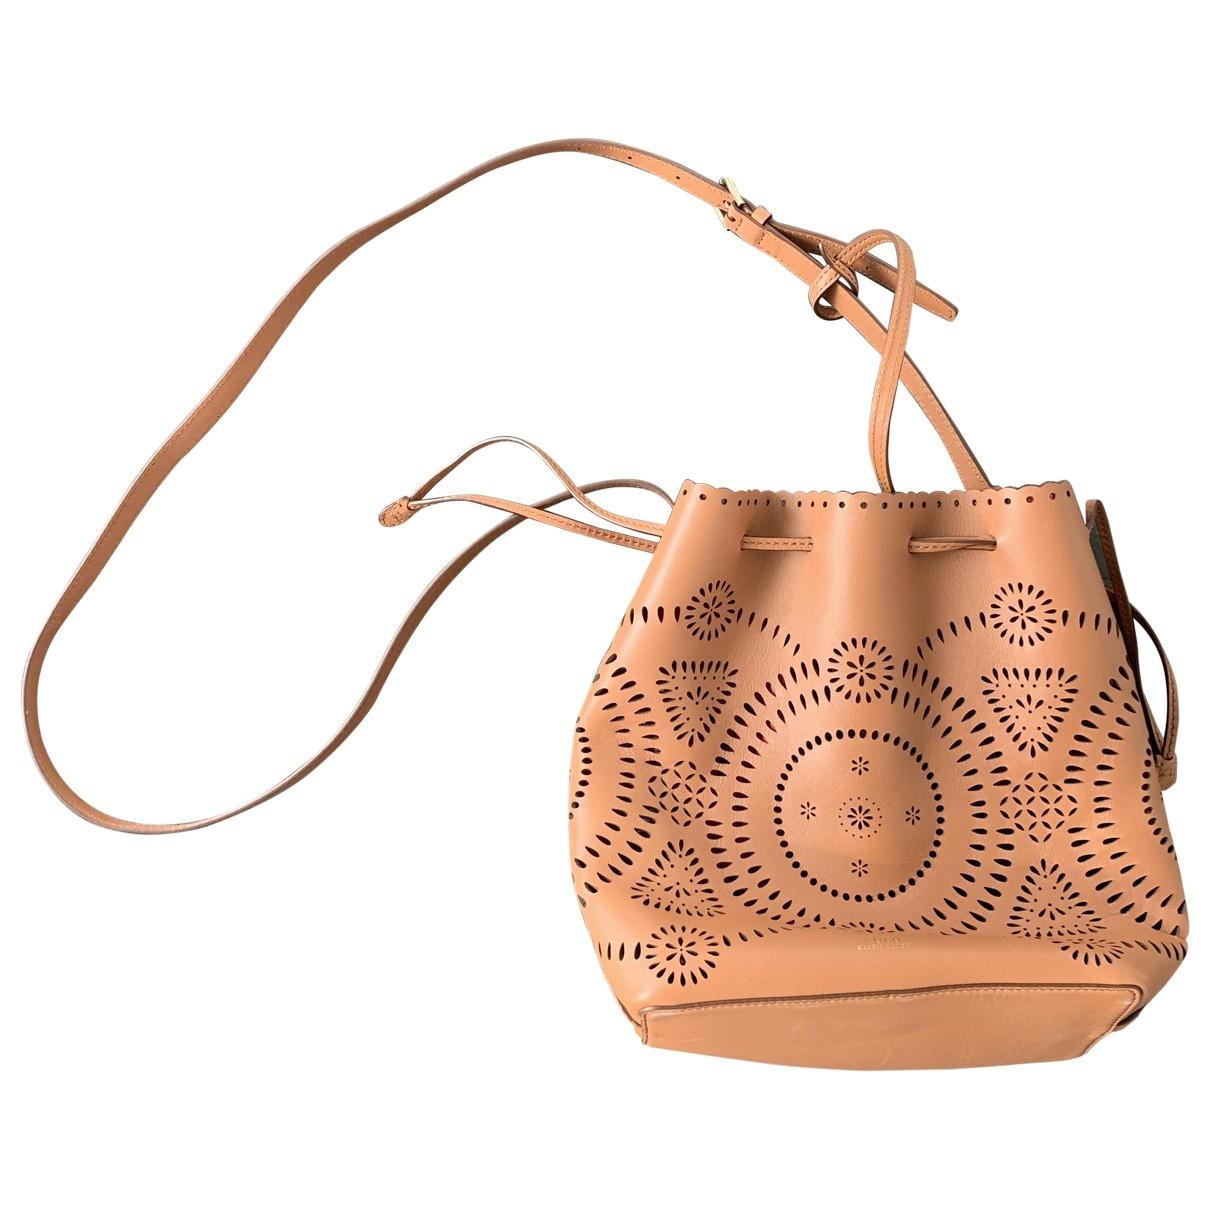 Polo Ralph Lauren \N Brown Leather handbag for Women \N